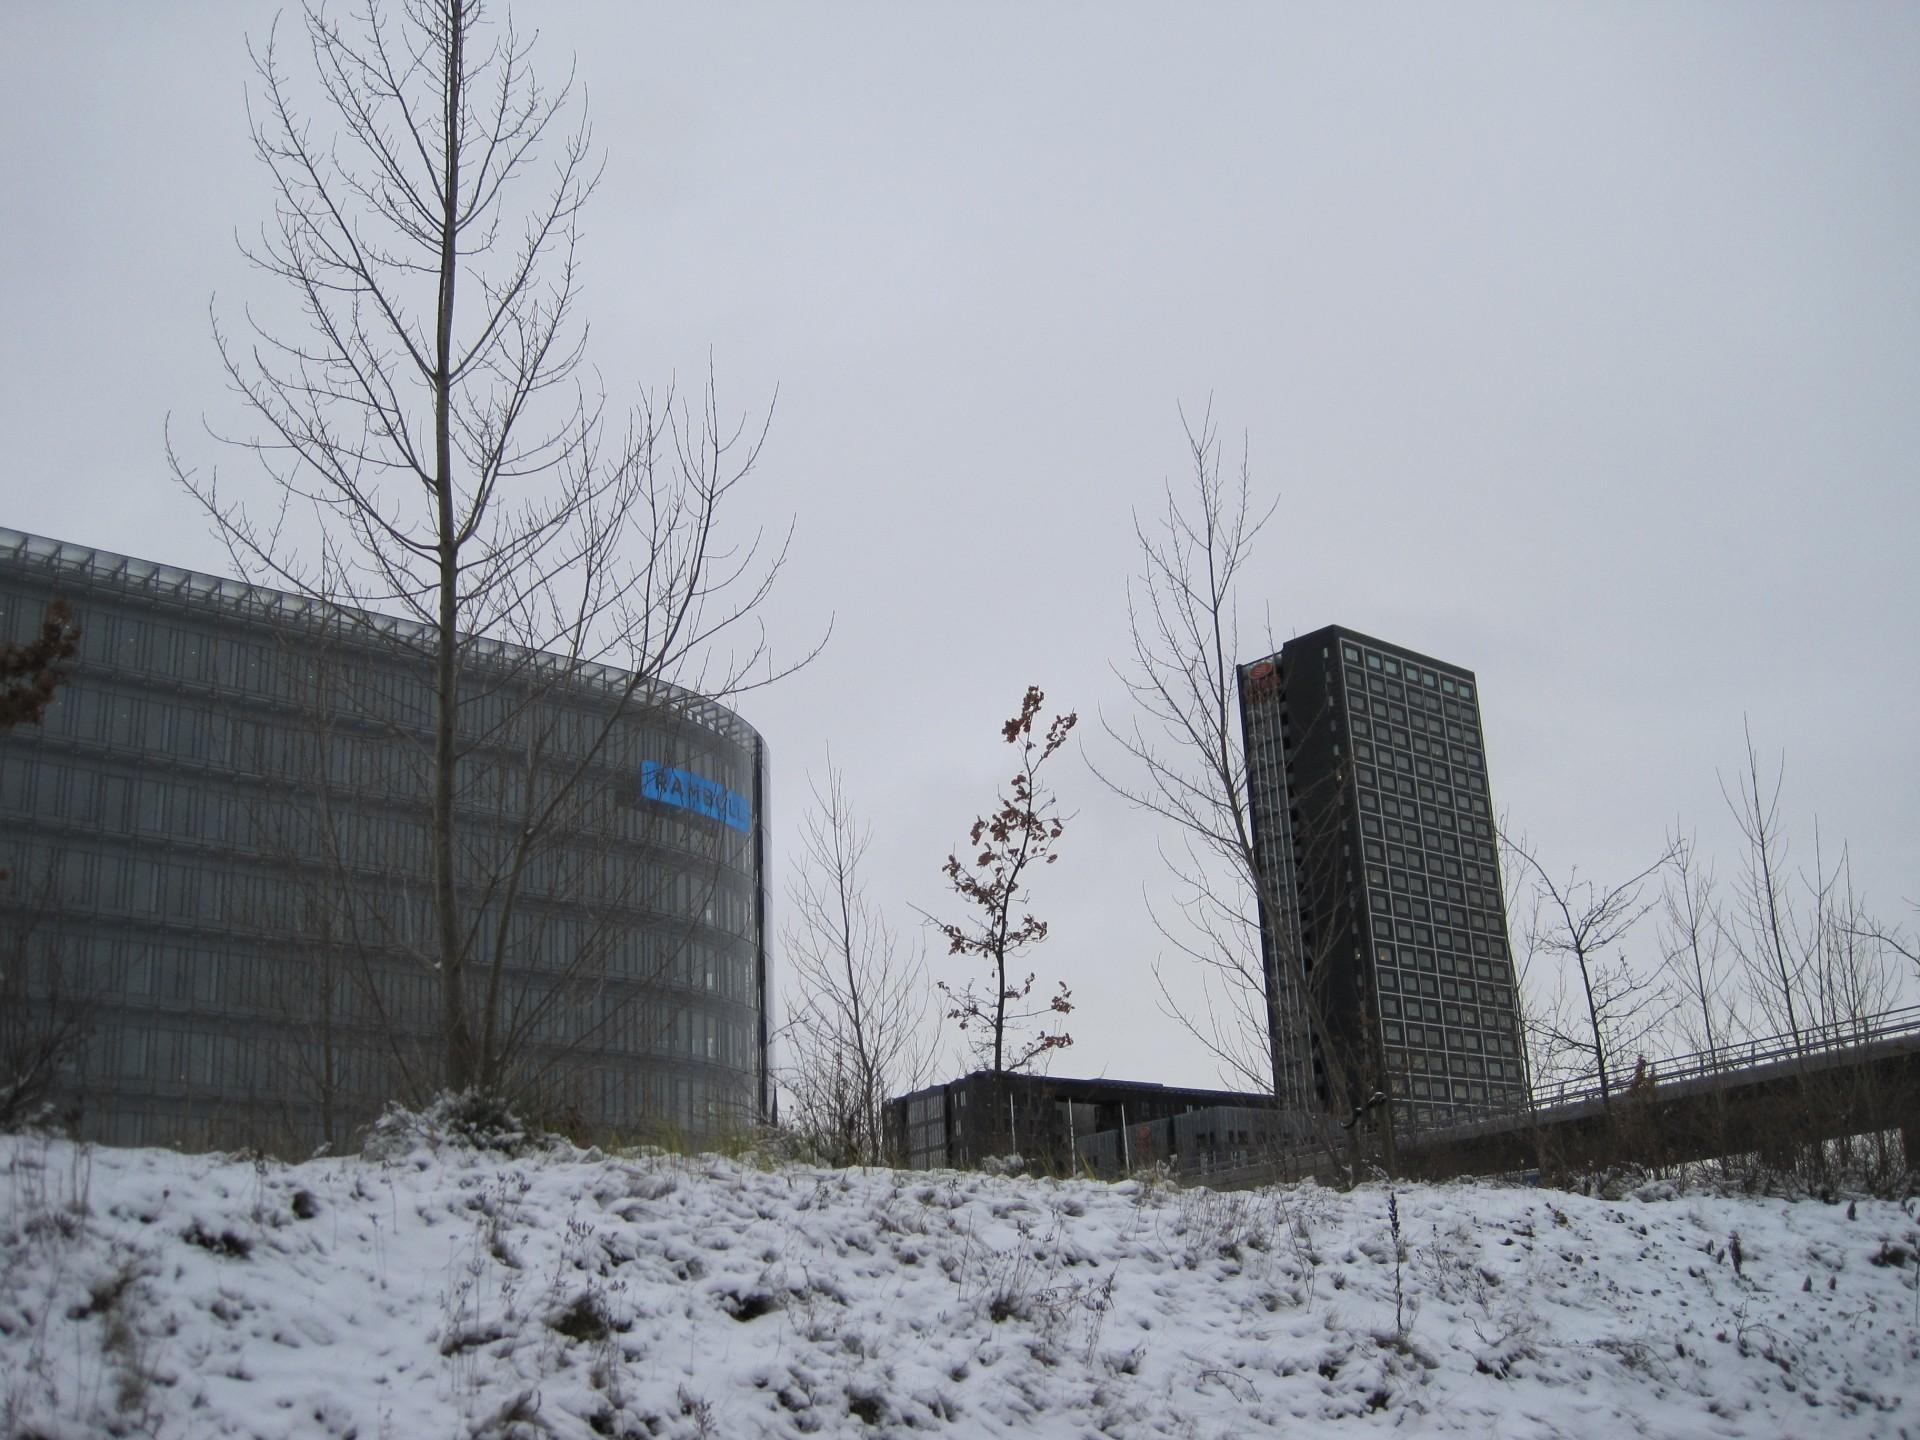 002 Ørestad